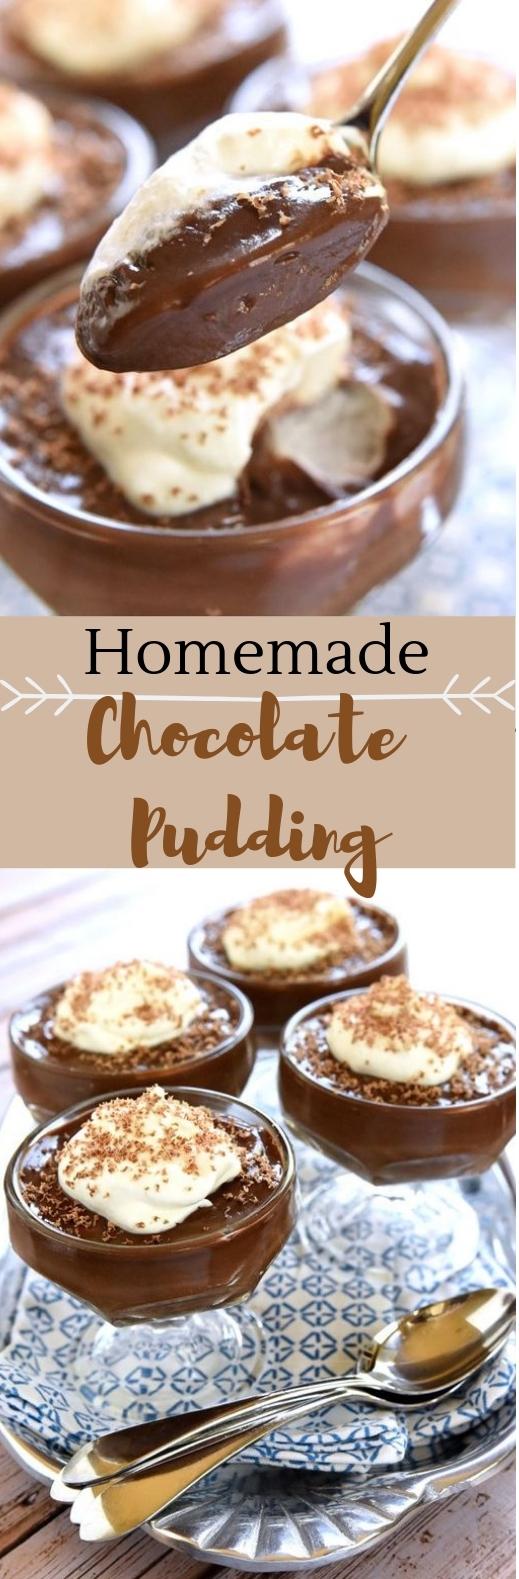 Homemade Chocolate Pudding #dessert #bestrecipe